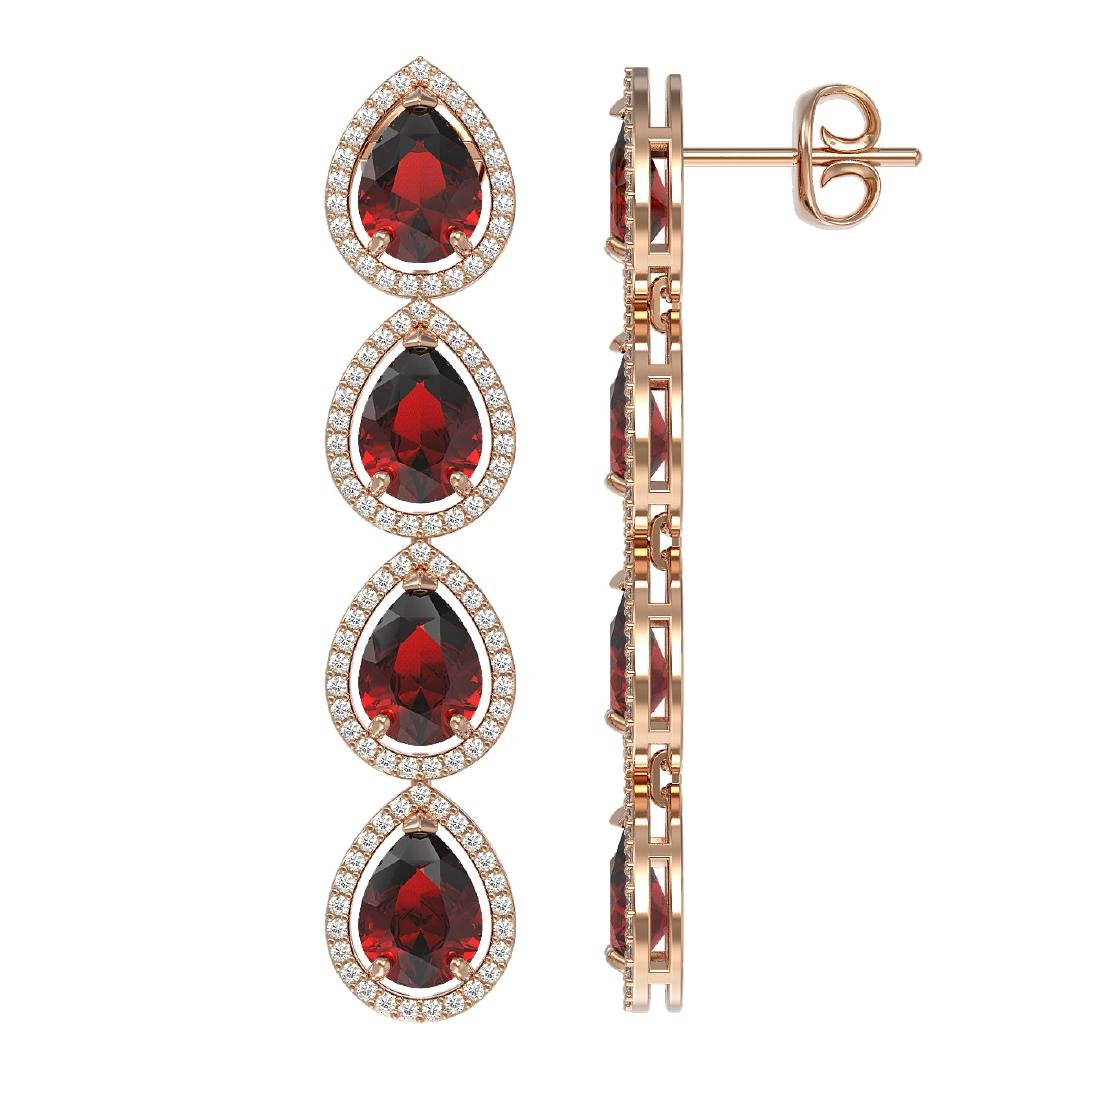 9.25 CTW Garnet & Diamond Halo Earrings 10K Rose Gold - 2